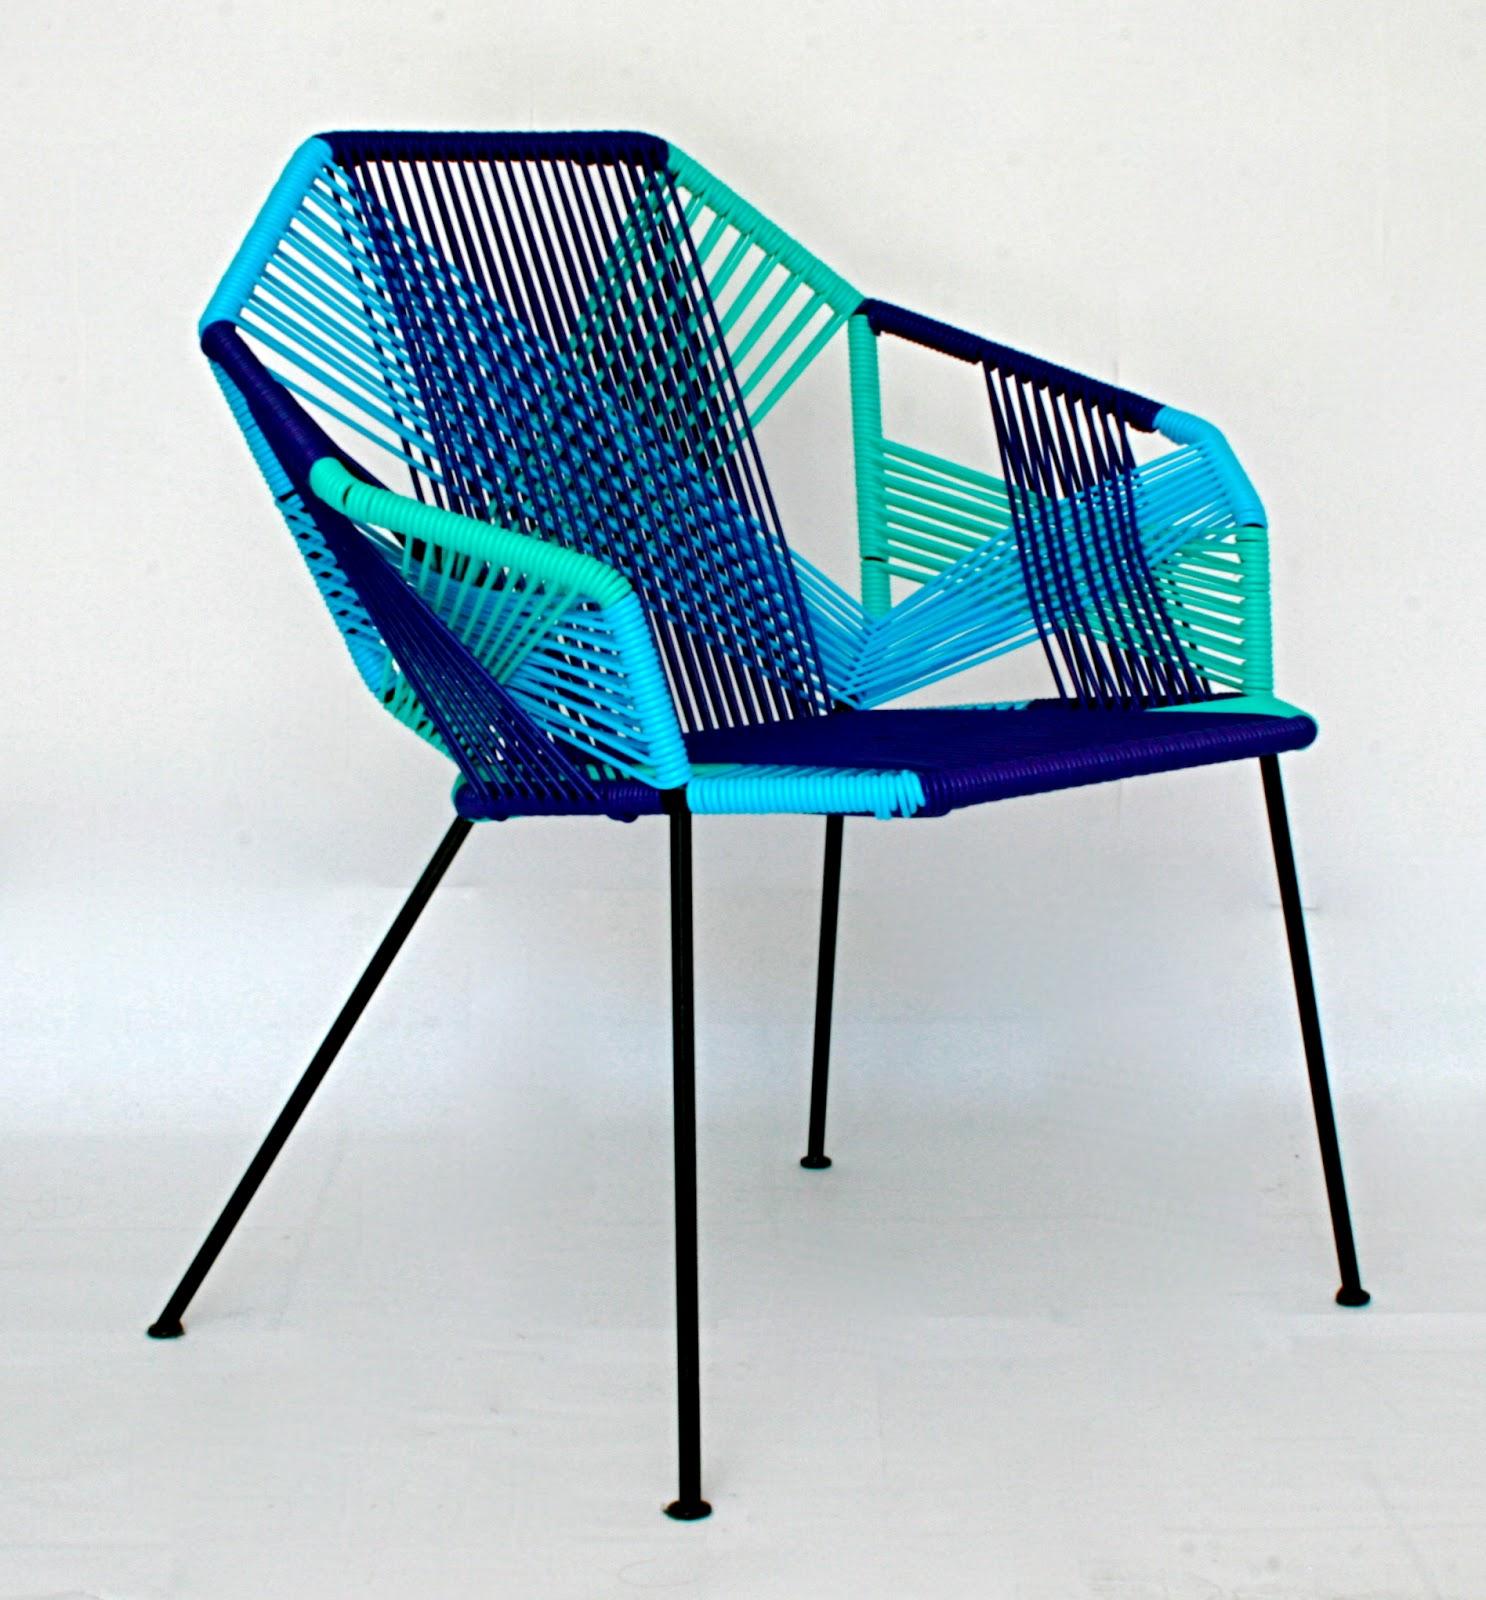 LA SILLA ACAPULCO Designs